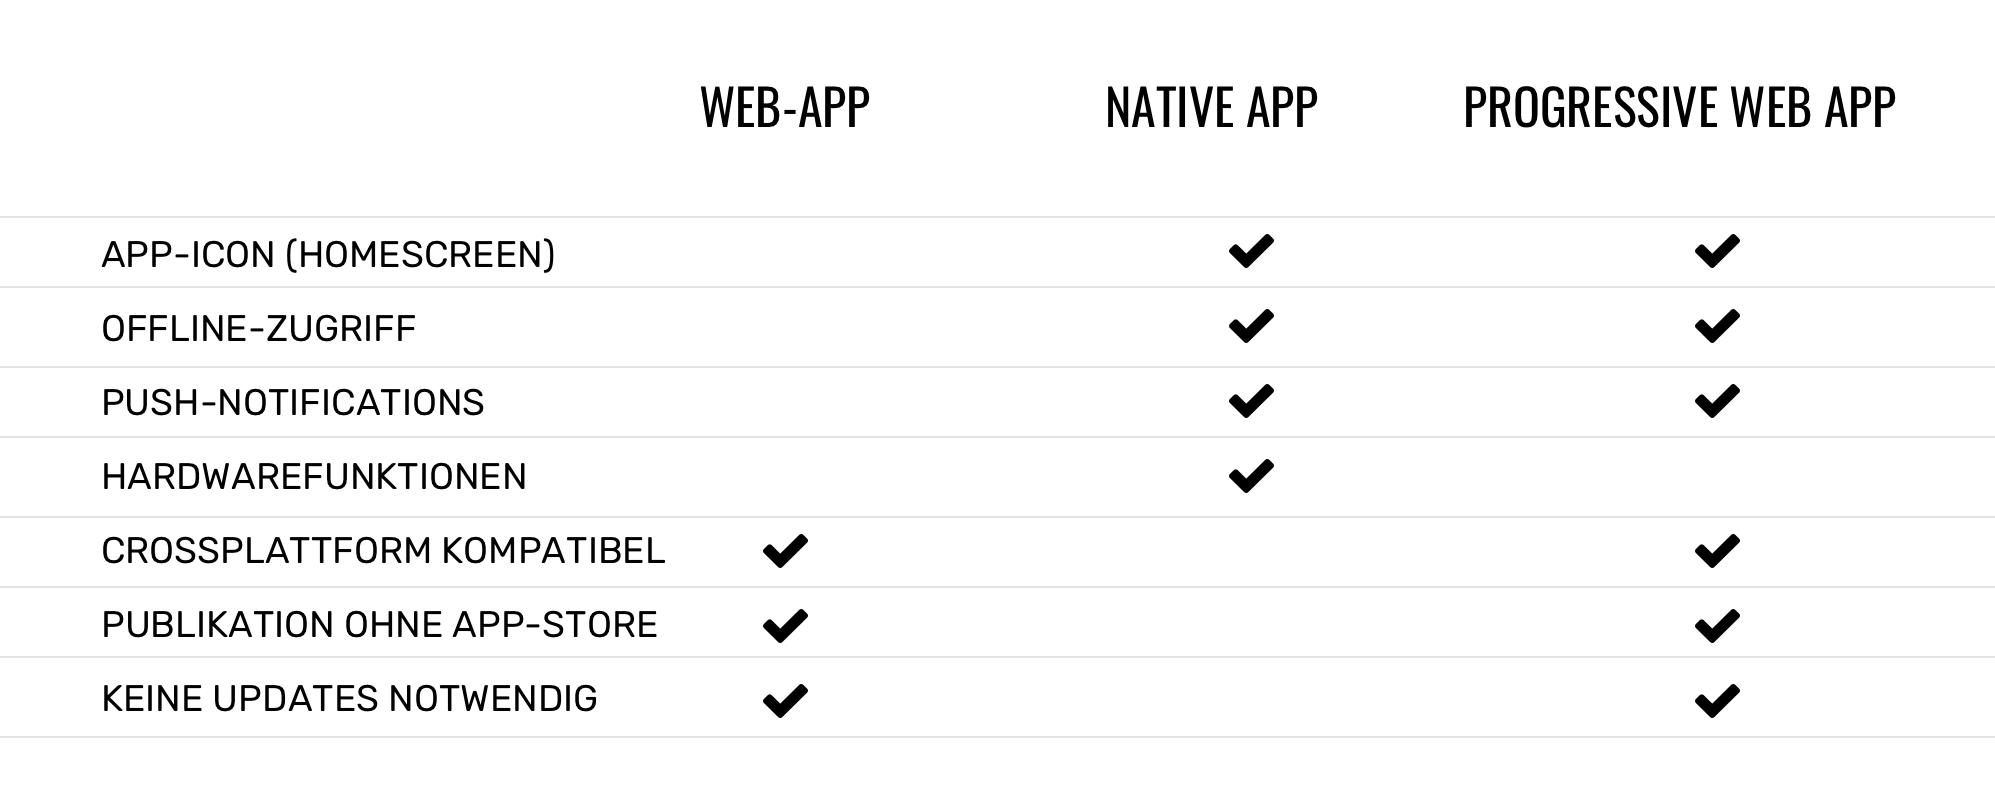 Vergleich Web-App, Native App, Progressive Web App (PWA)